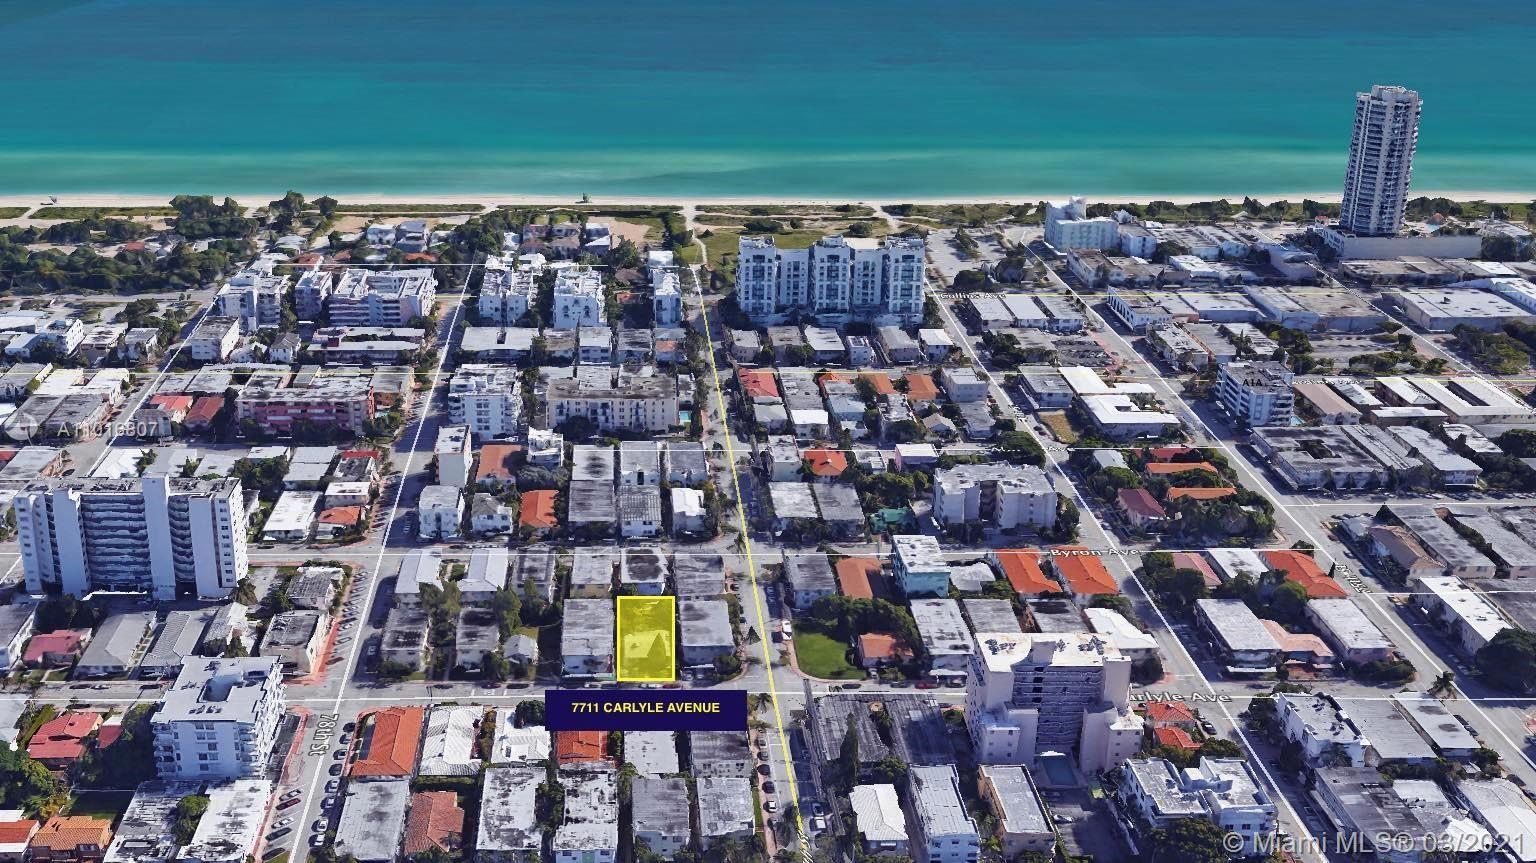 7711 Carlyle Ave, Miami Beach, FL 33141 - #: A11016807